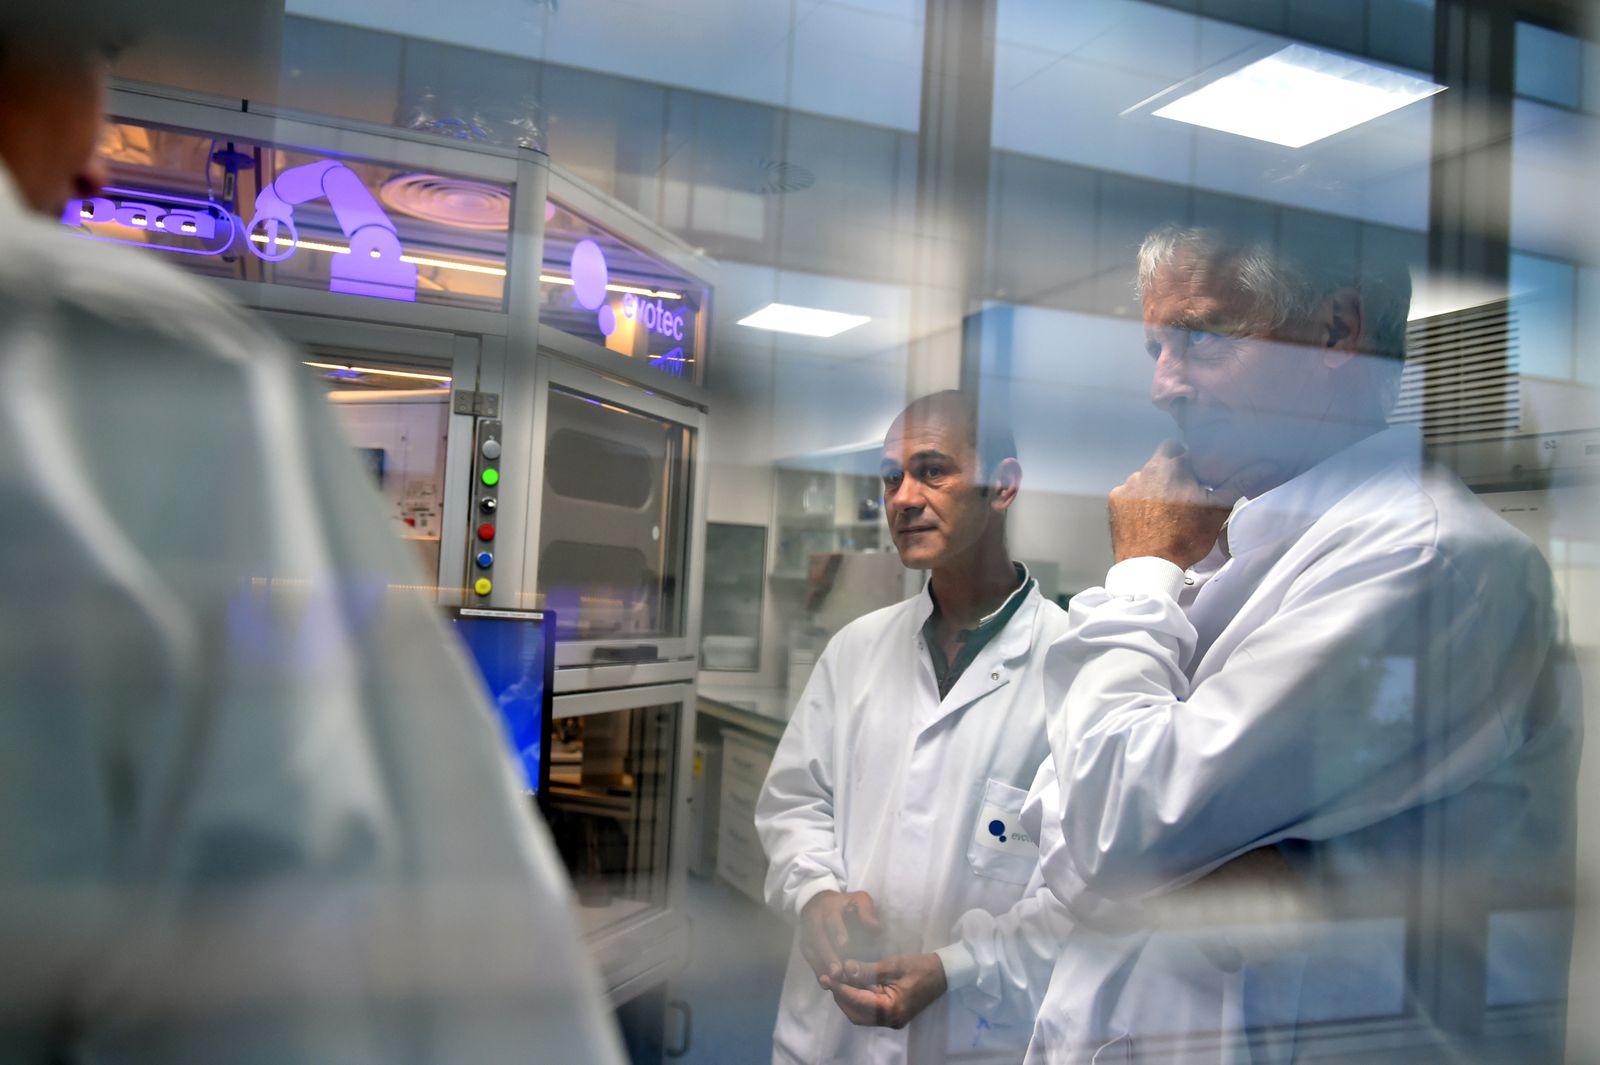 Evotec / Biotech / Pharma